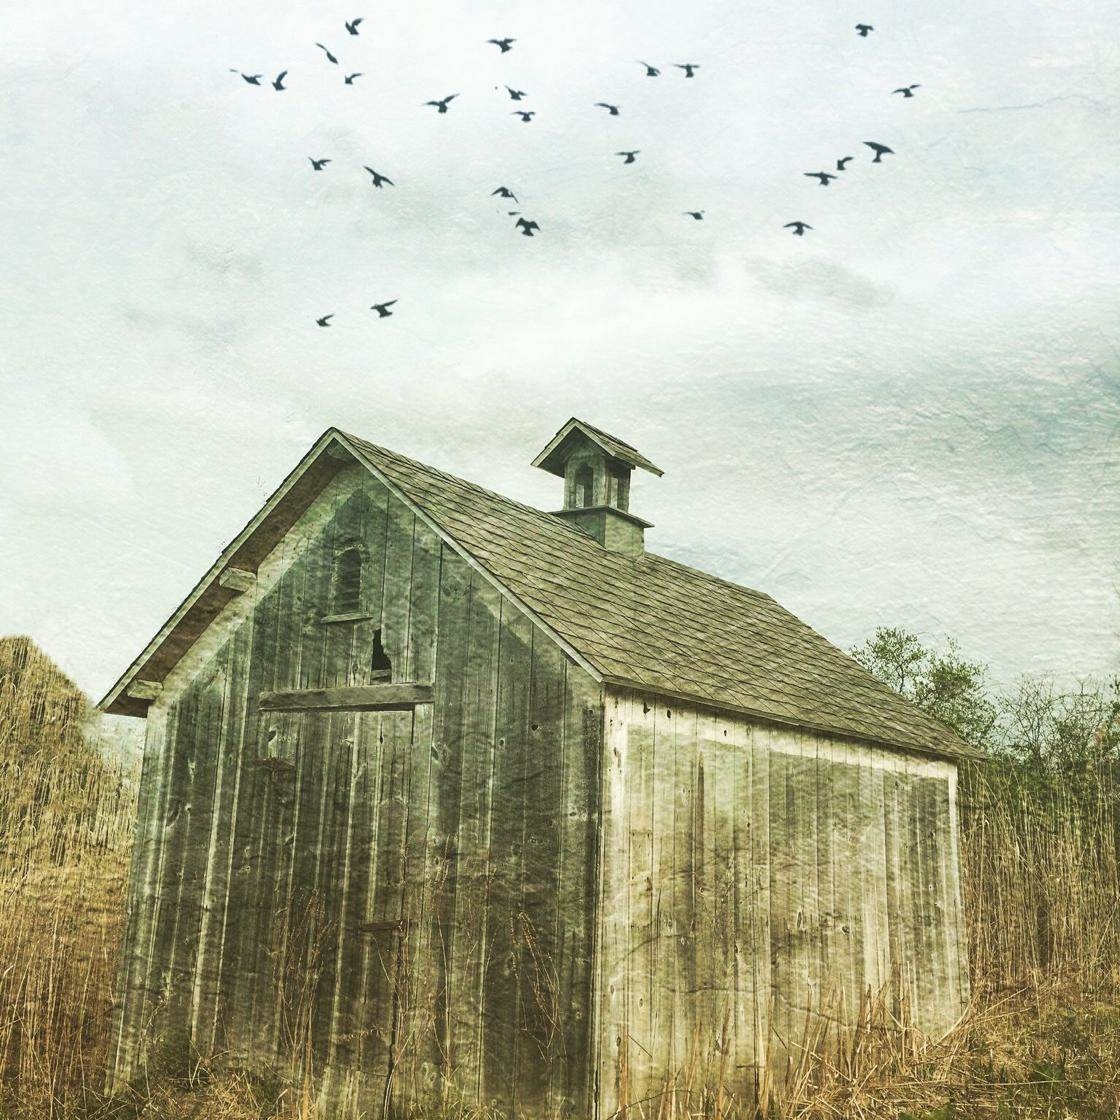 Rural Scenes-02 no script